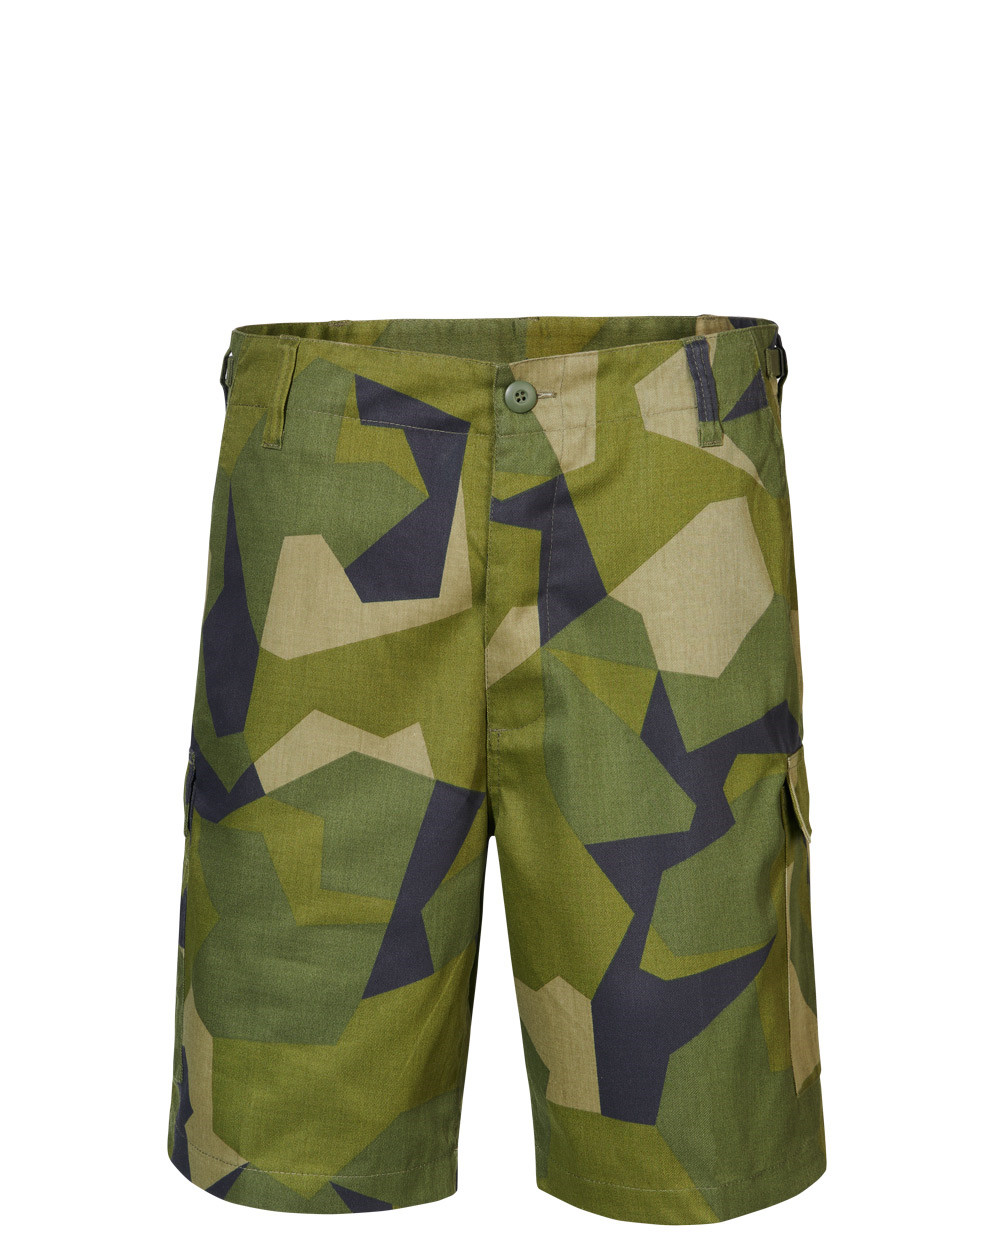 Brandit US Ranger Shorts Swedish M/90 (Svensk M/90, XL)